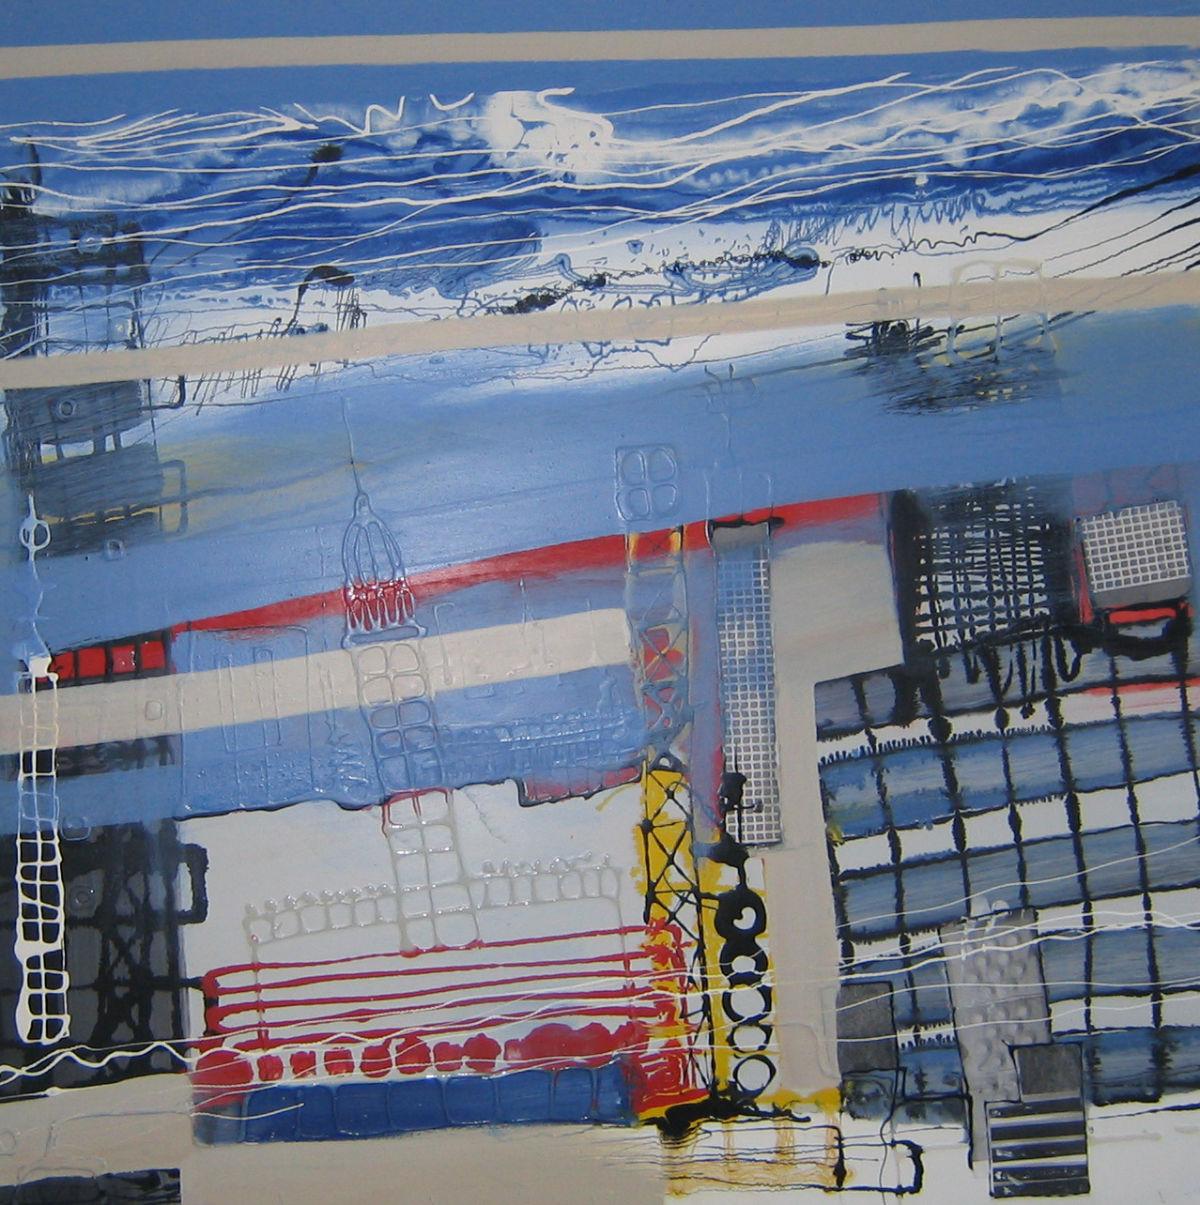 Ohne Titel, Lack, s/w Kopien, Heißkleber auf Holz, 100 cm x 100 cm, Preis: 3200.- Euro